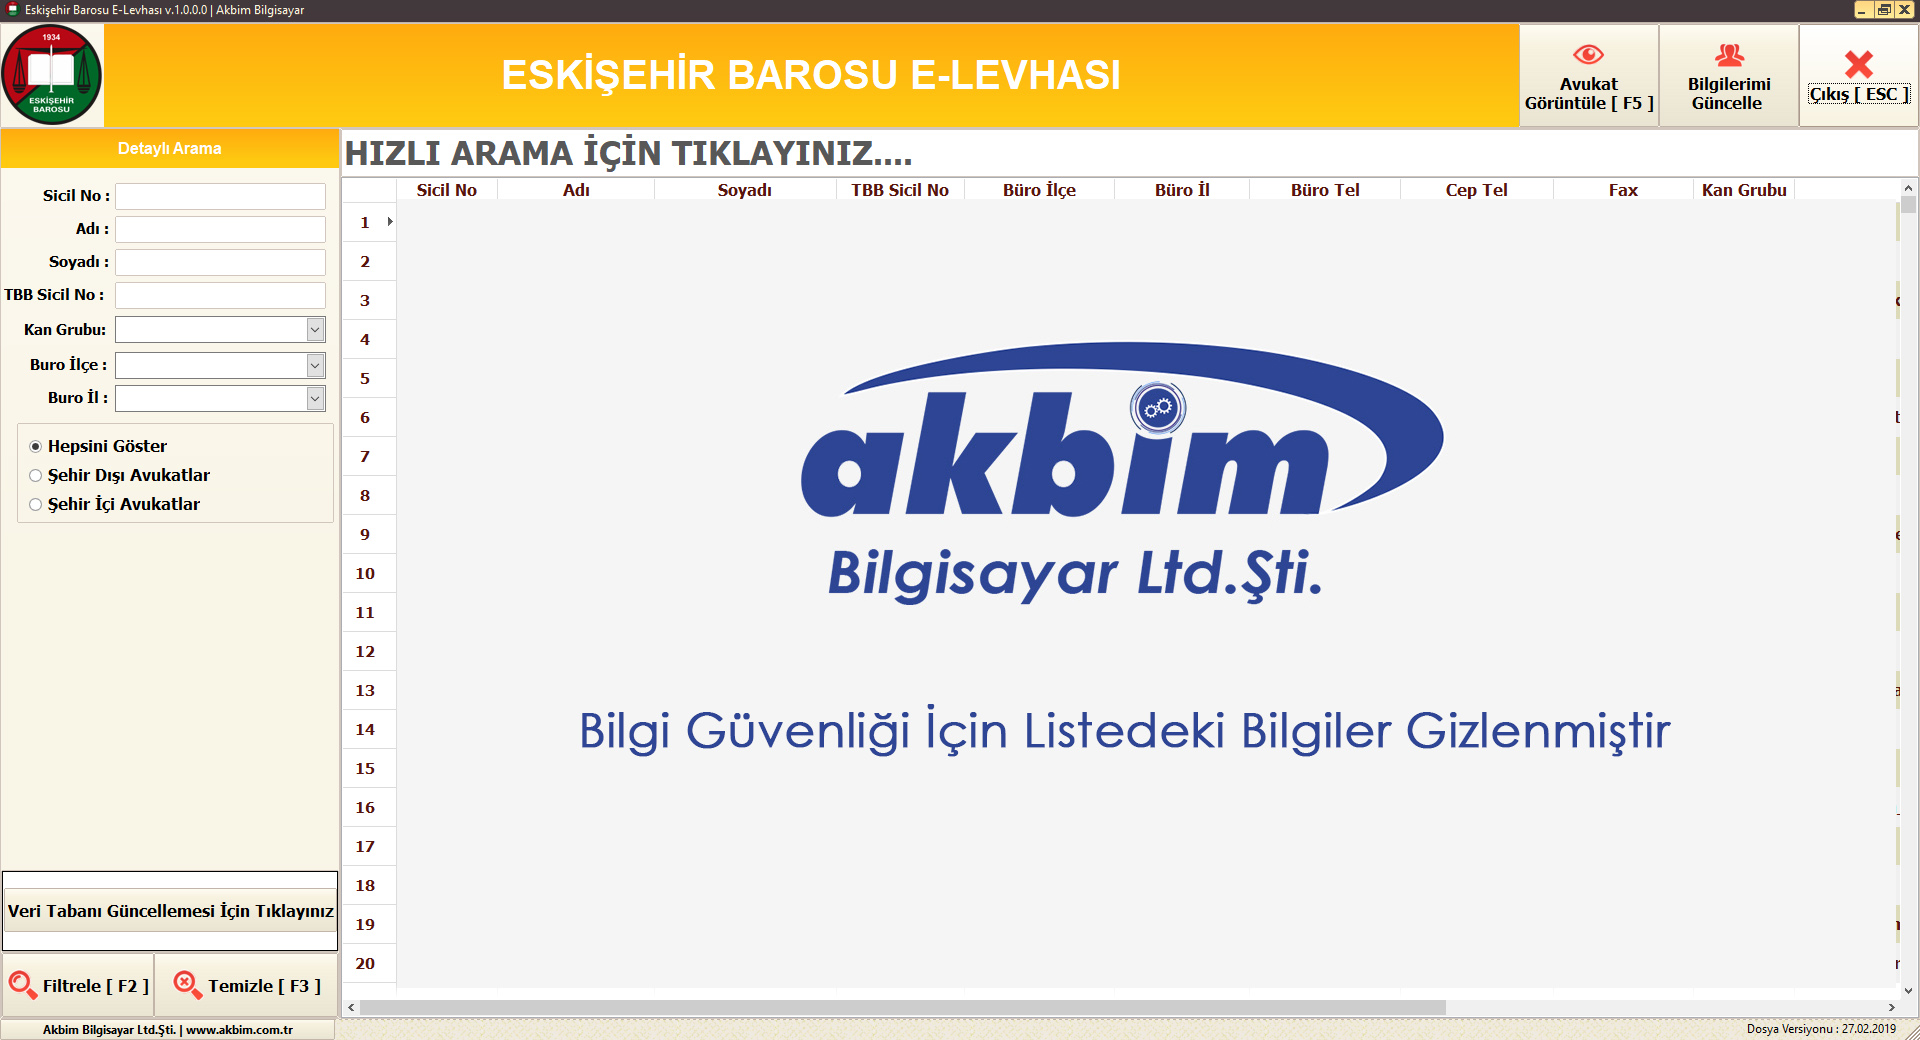 Eskişehir Barosu E-Levha - Akbim Bilgisayar